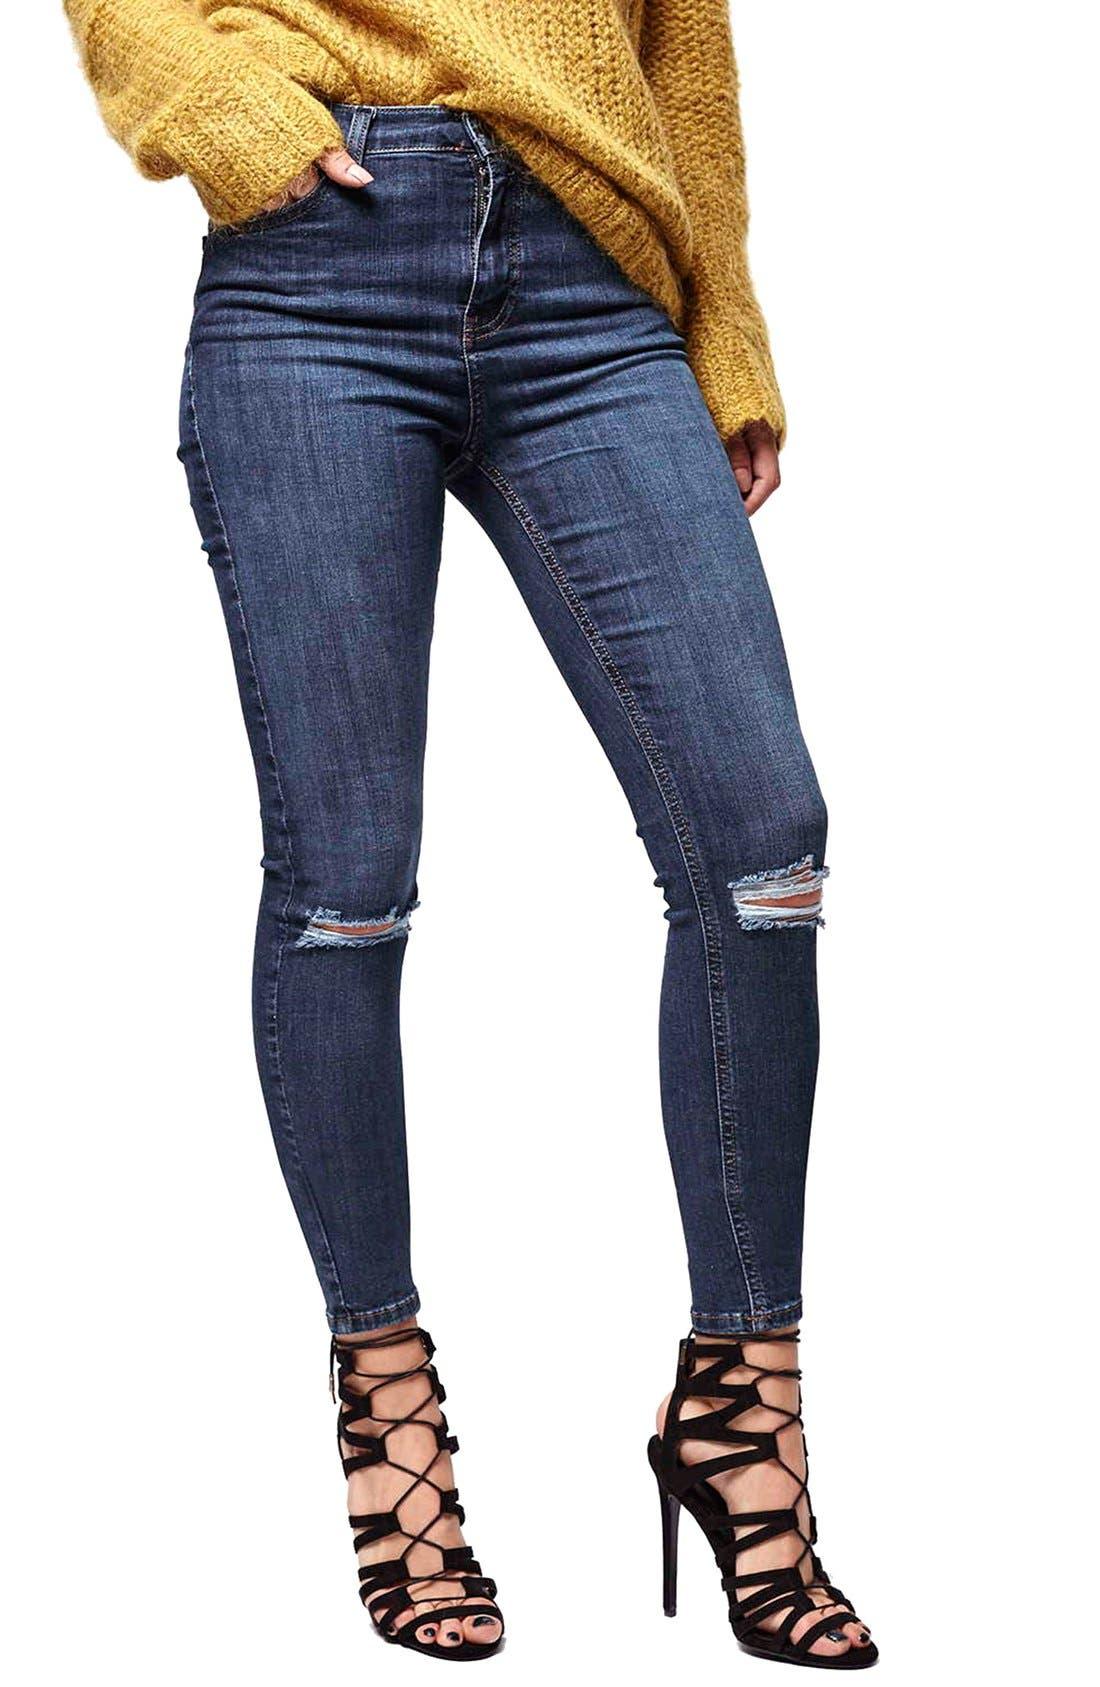 Alternate Image 1 Selected - Topshop Moto 'Jamie' Ripped Skinny Jeans